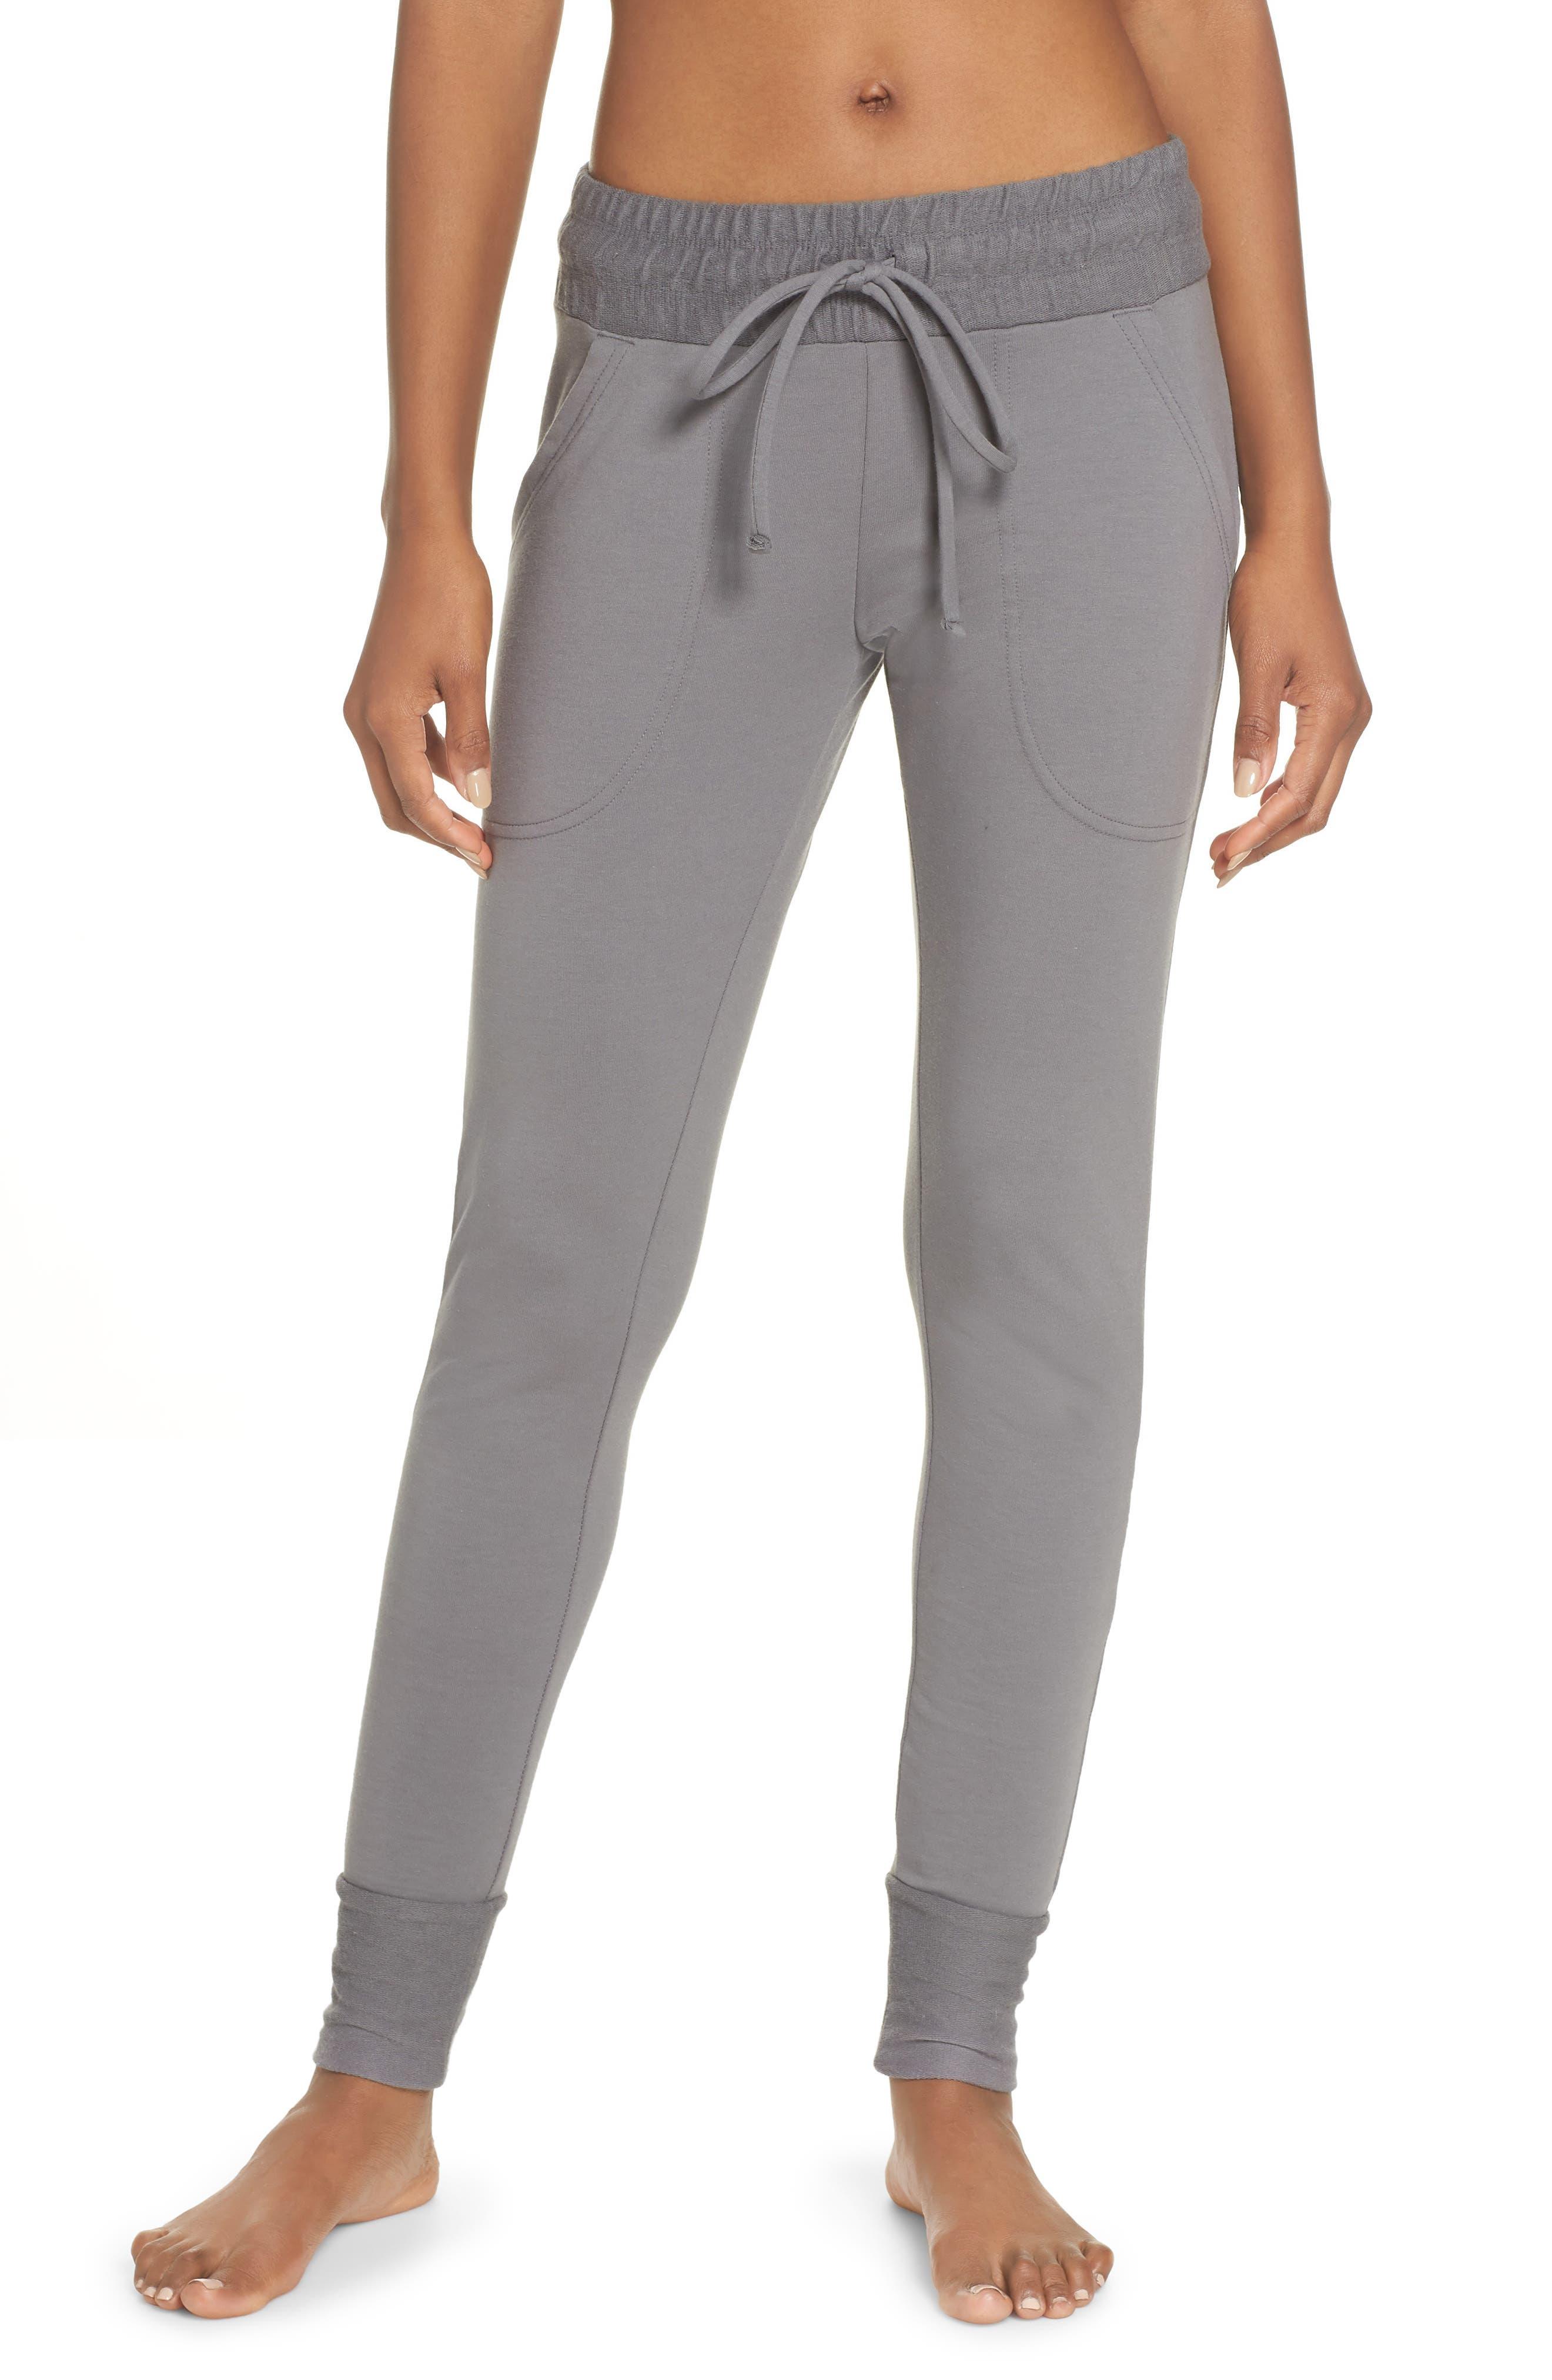 Sunny Skinny Sweatpants,                             Main thumbnail 1, color,                             Dark Grey